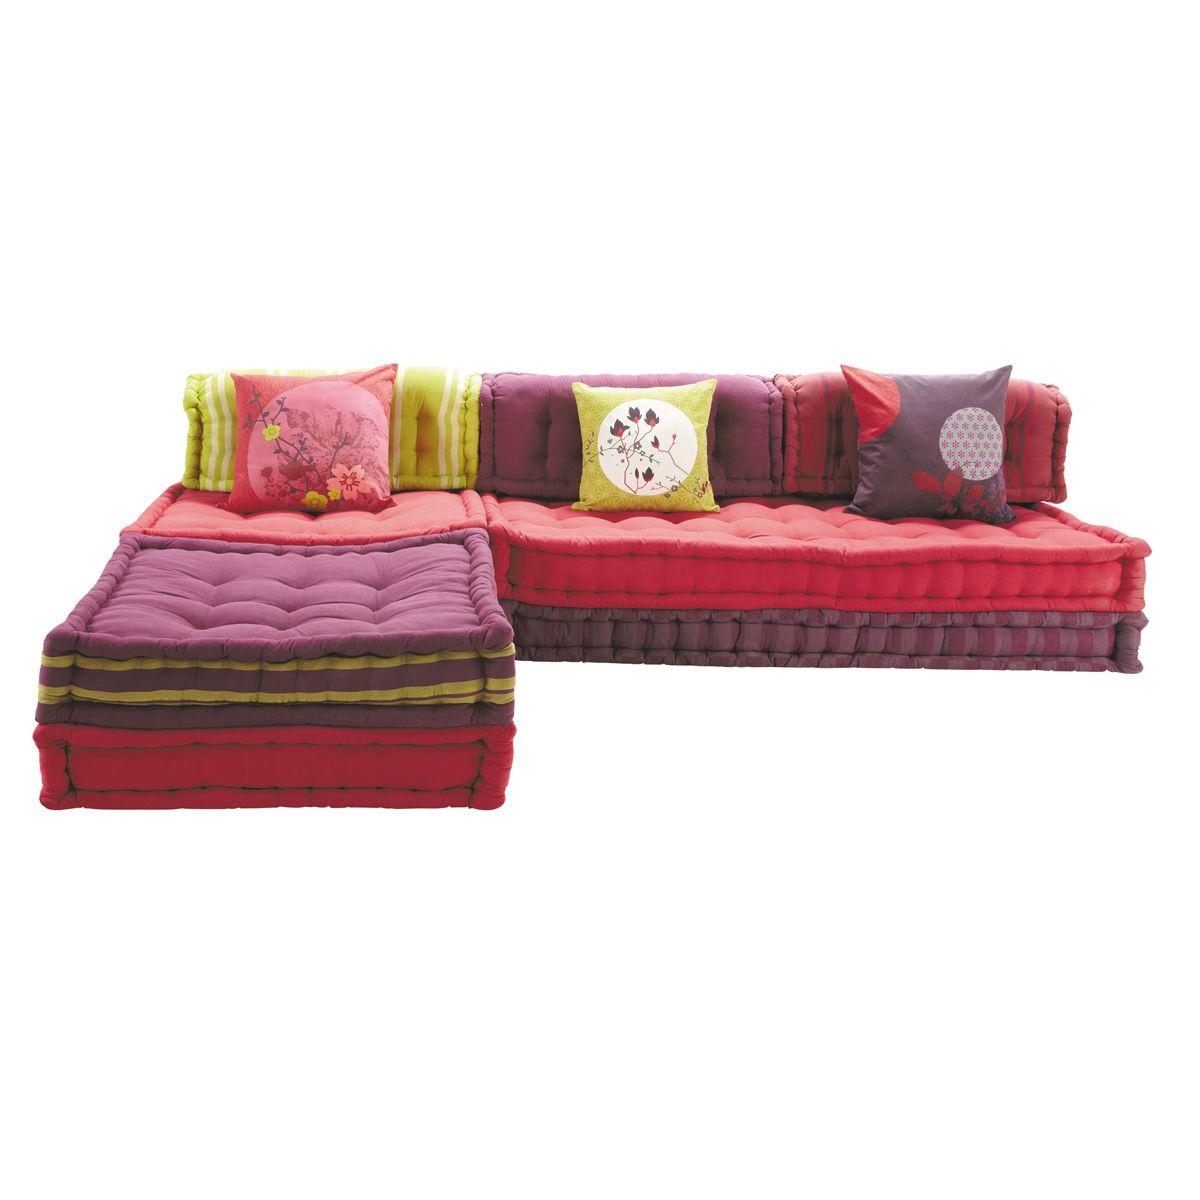 Divani Angolari Maison Du Monde.6 Seater Cotton Modular Corner Day Bed In Pink In 2019 Have A Seat